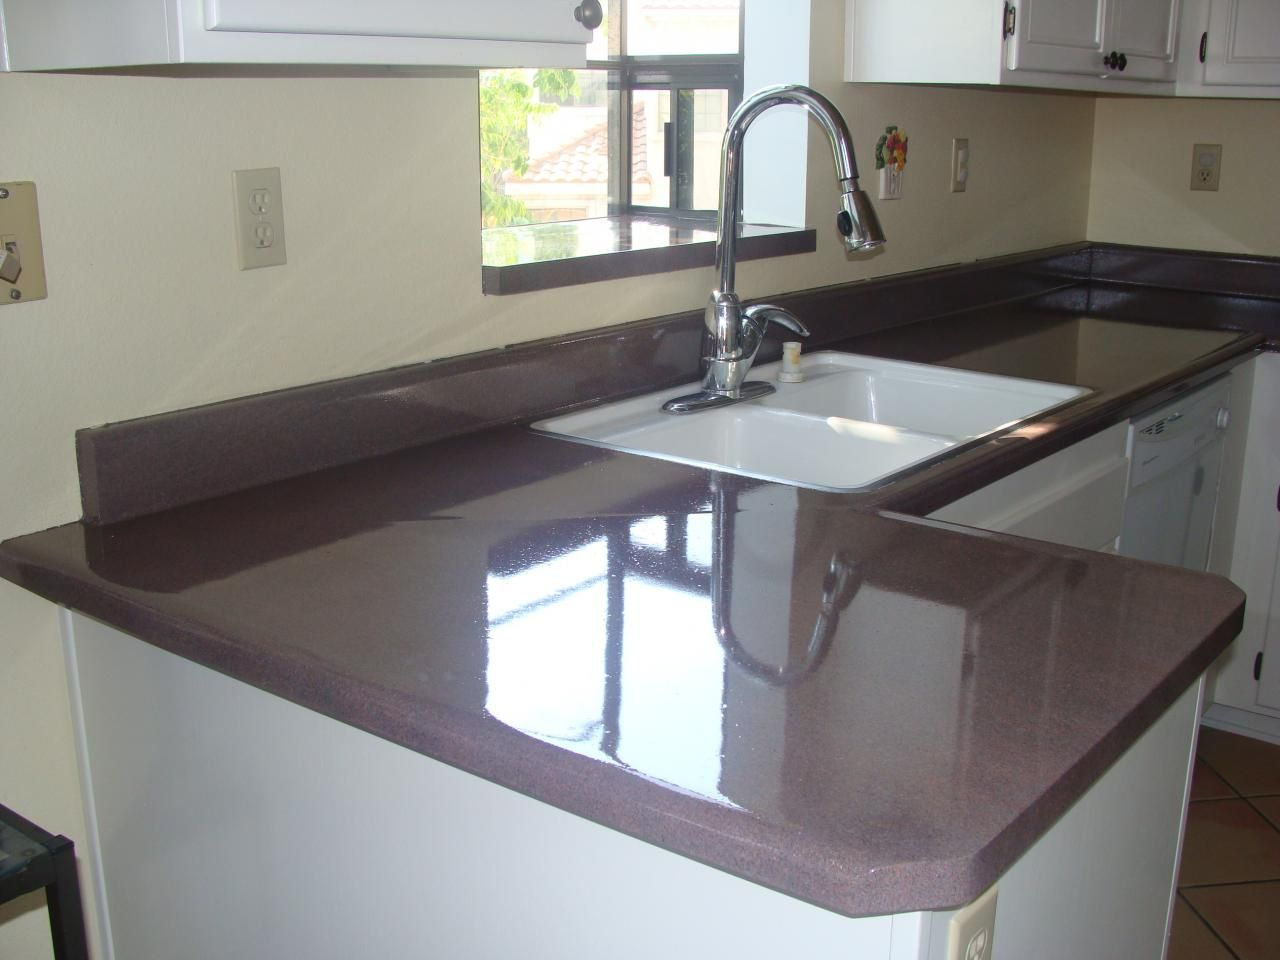 Pkb Reglazing Laminate Countertop Reglazed Balmorai Red Speckled Countertops Laminate Countertops Home Decor